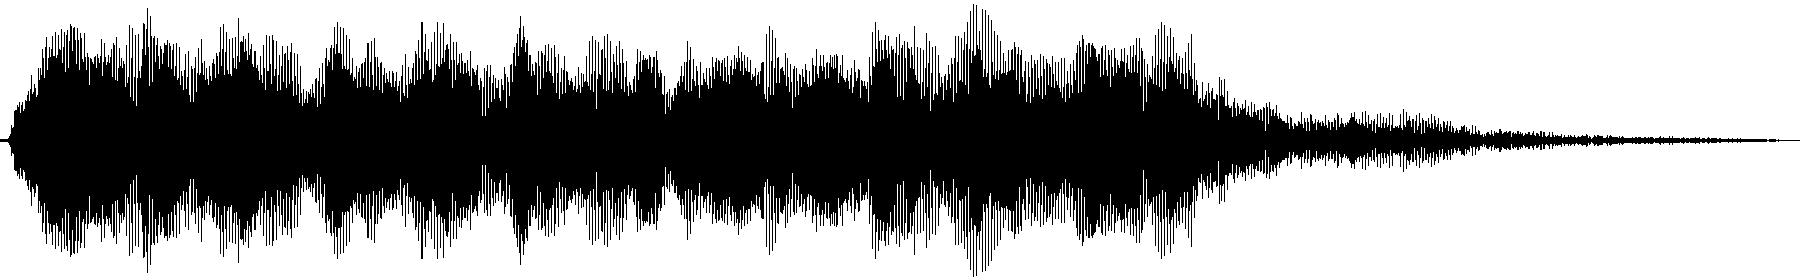 horn of a ship c